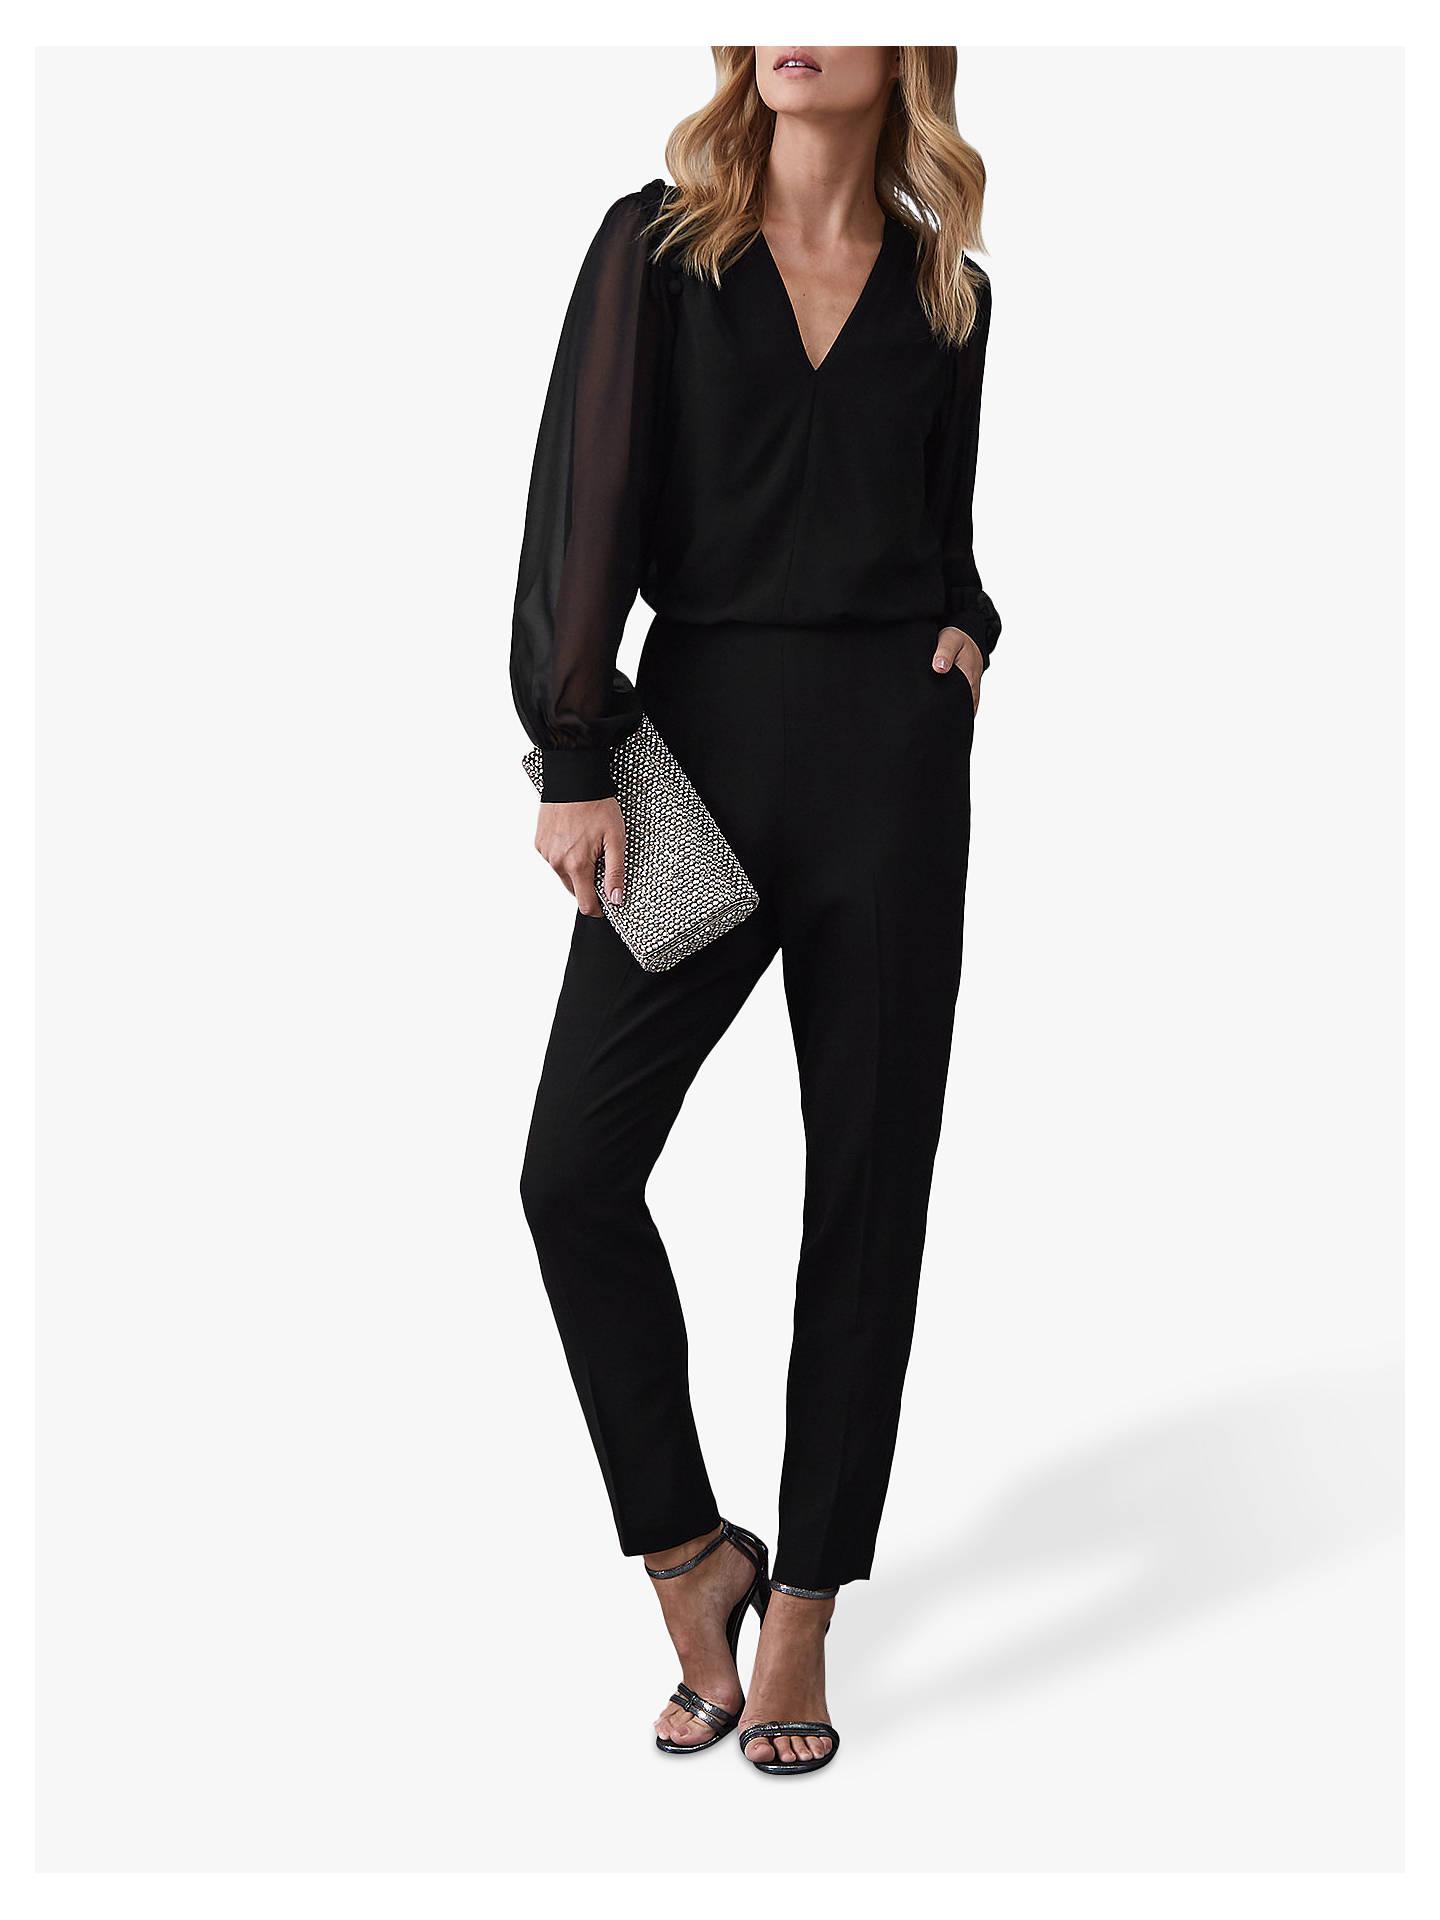 6d3e5ee0eee Buy Reiss Adeliza Button Detail Jumpsuit